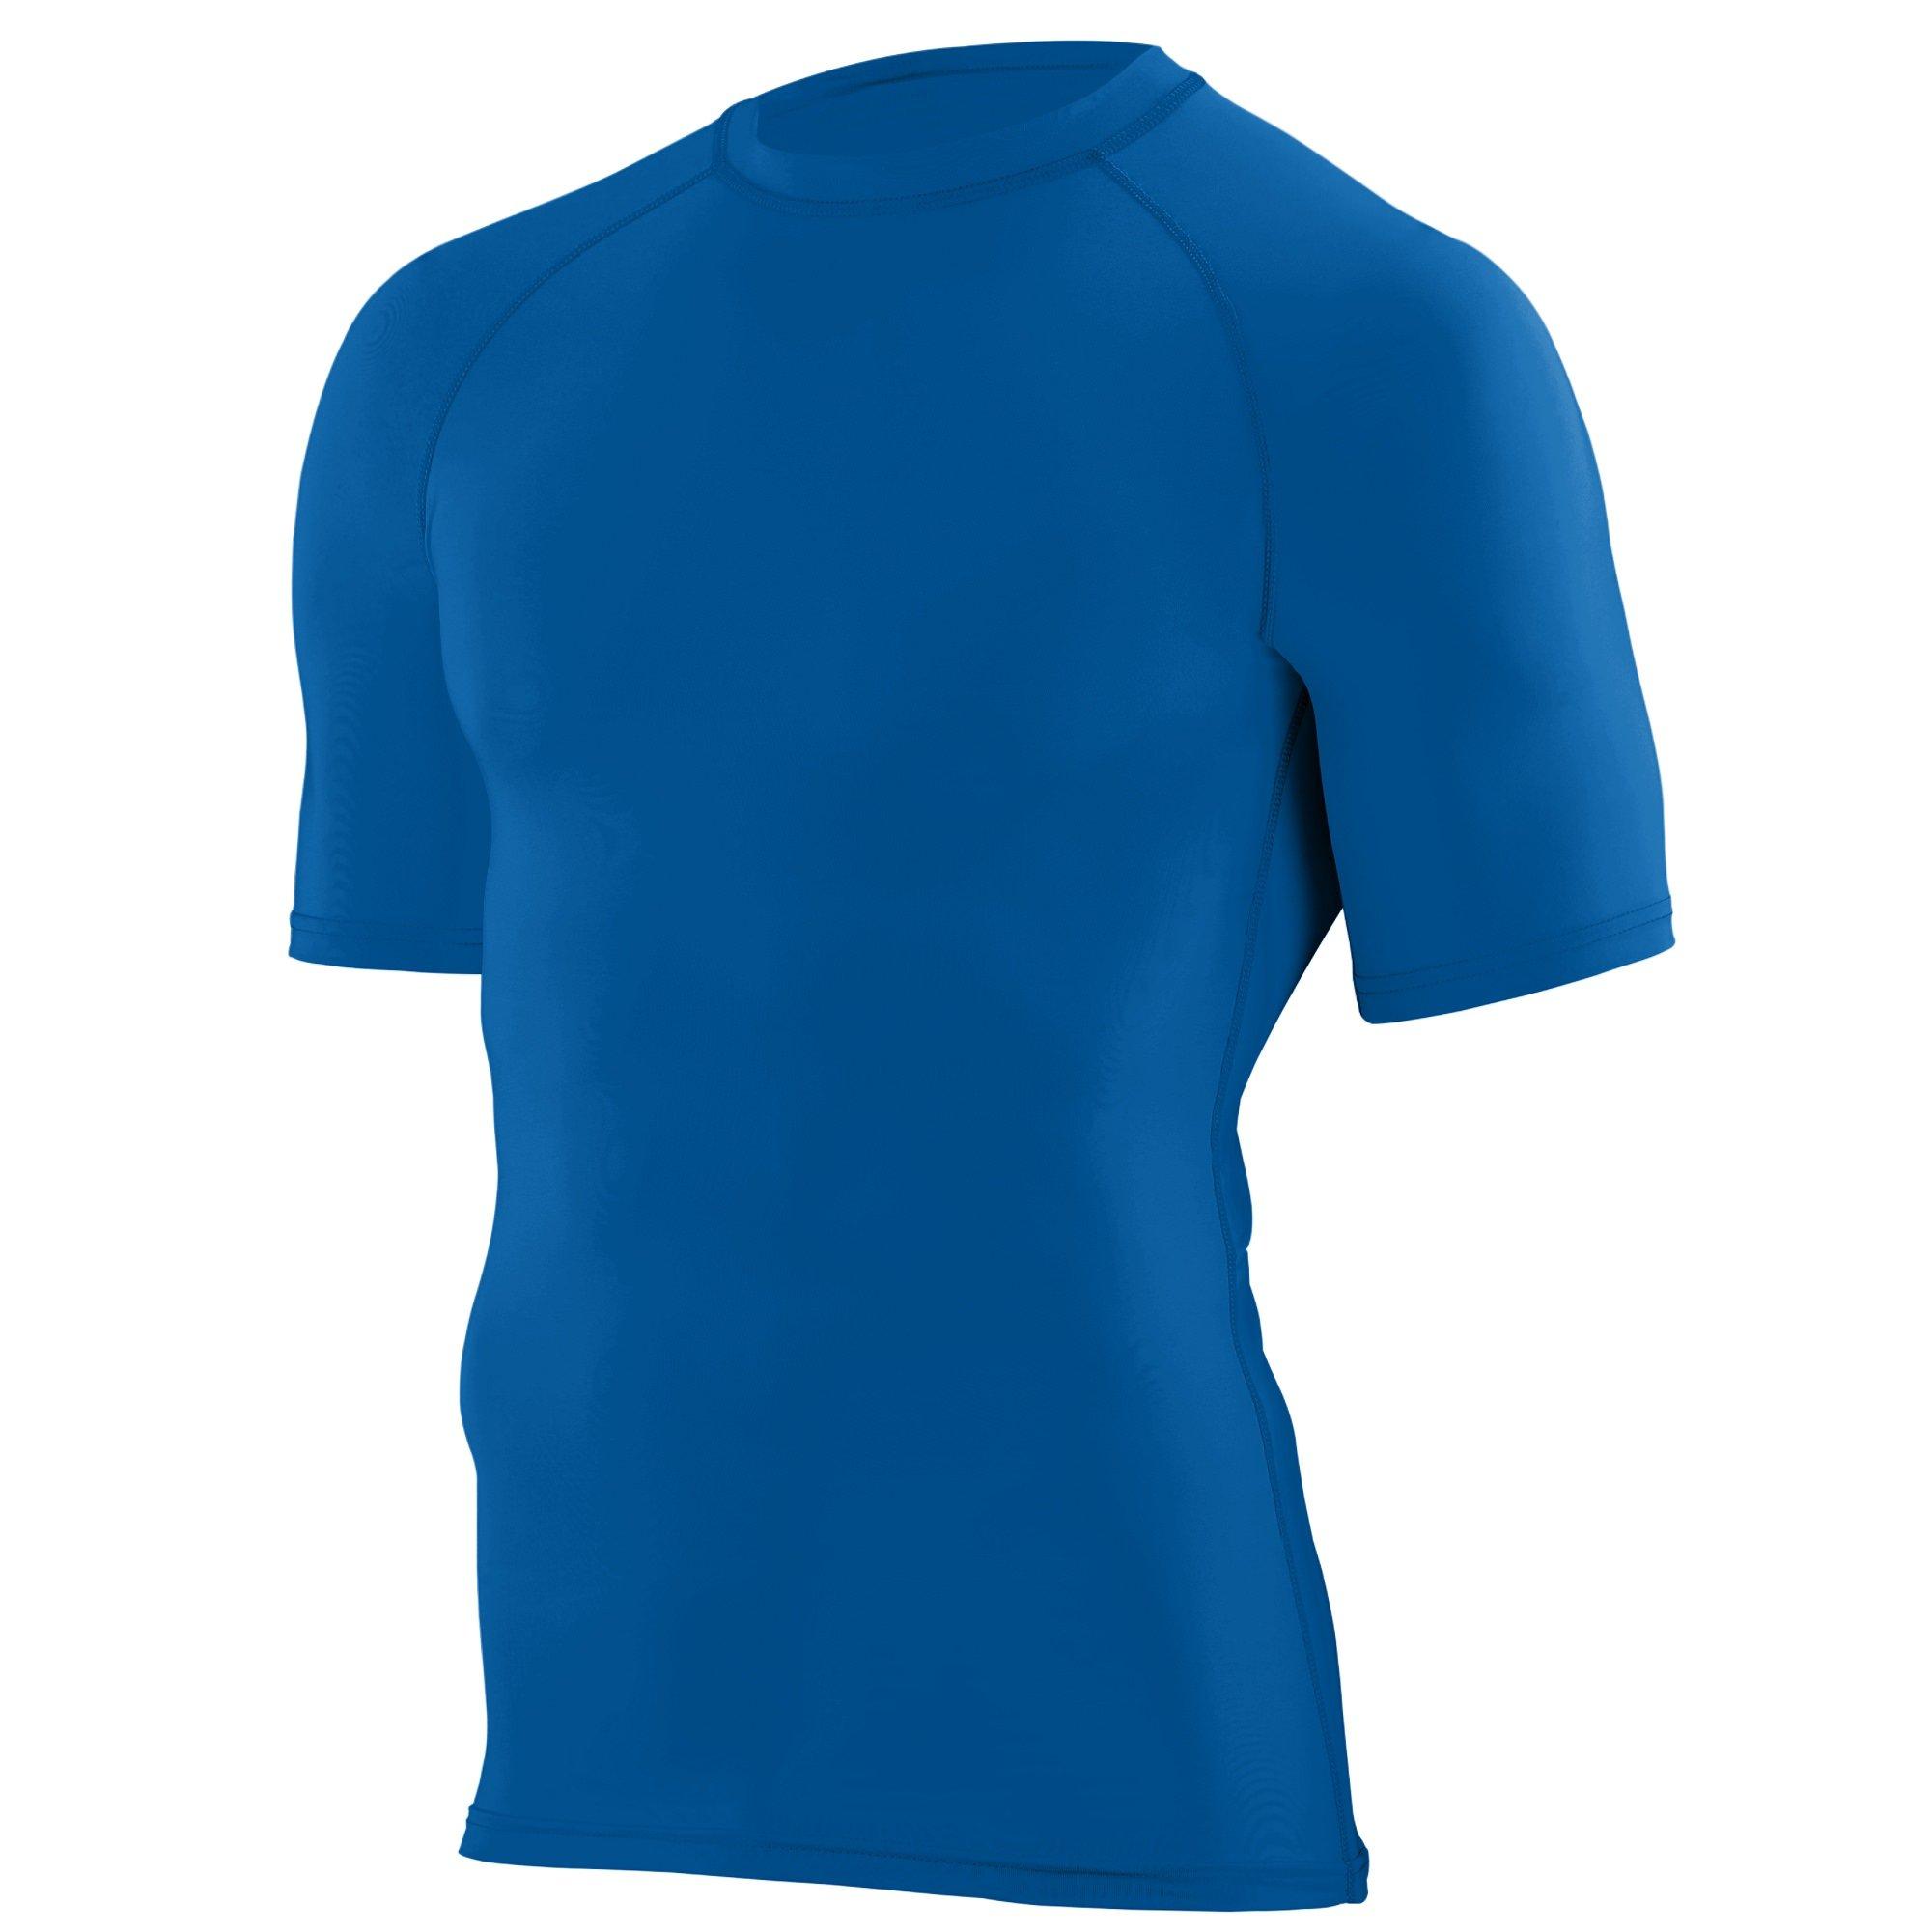 Augusta Sportswear Boys' Hyperform Compression Short Sleeve Shirt S Royal